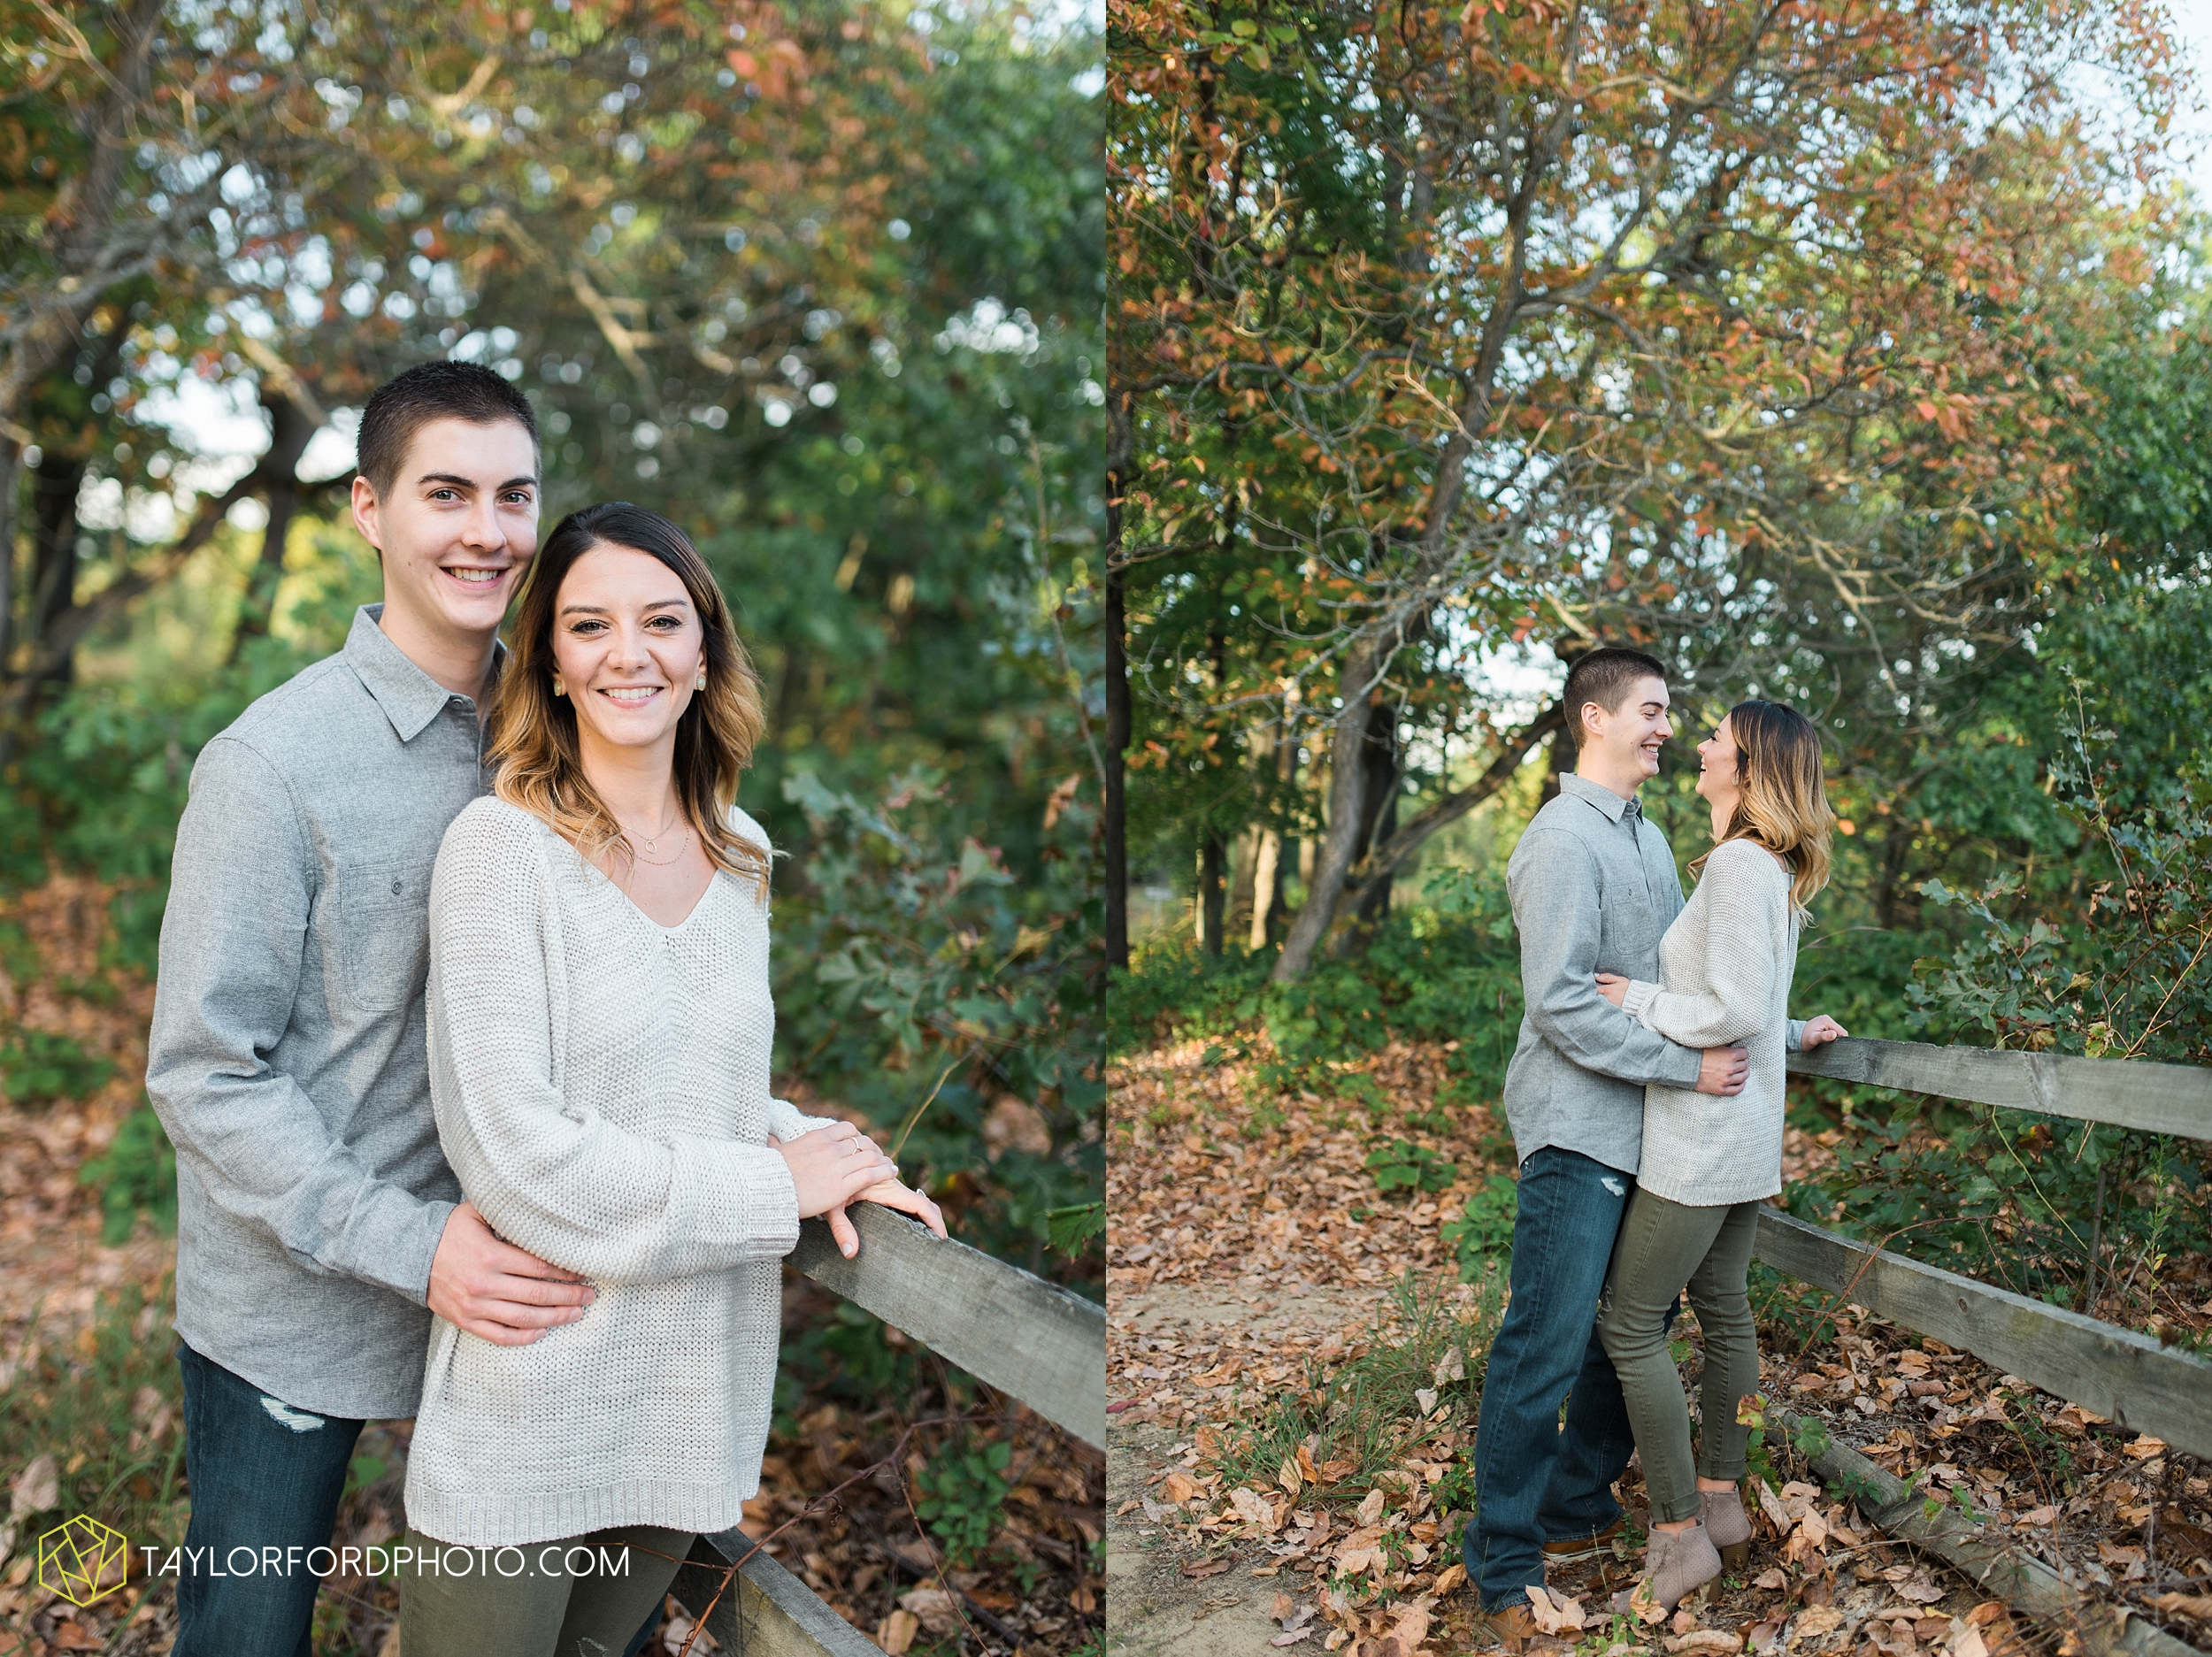 toledo-ohio-engagement-wedding-photographer-Taylor-Ford-Photography-oaks-openings-toledo-metro_3679.jpg